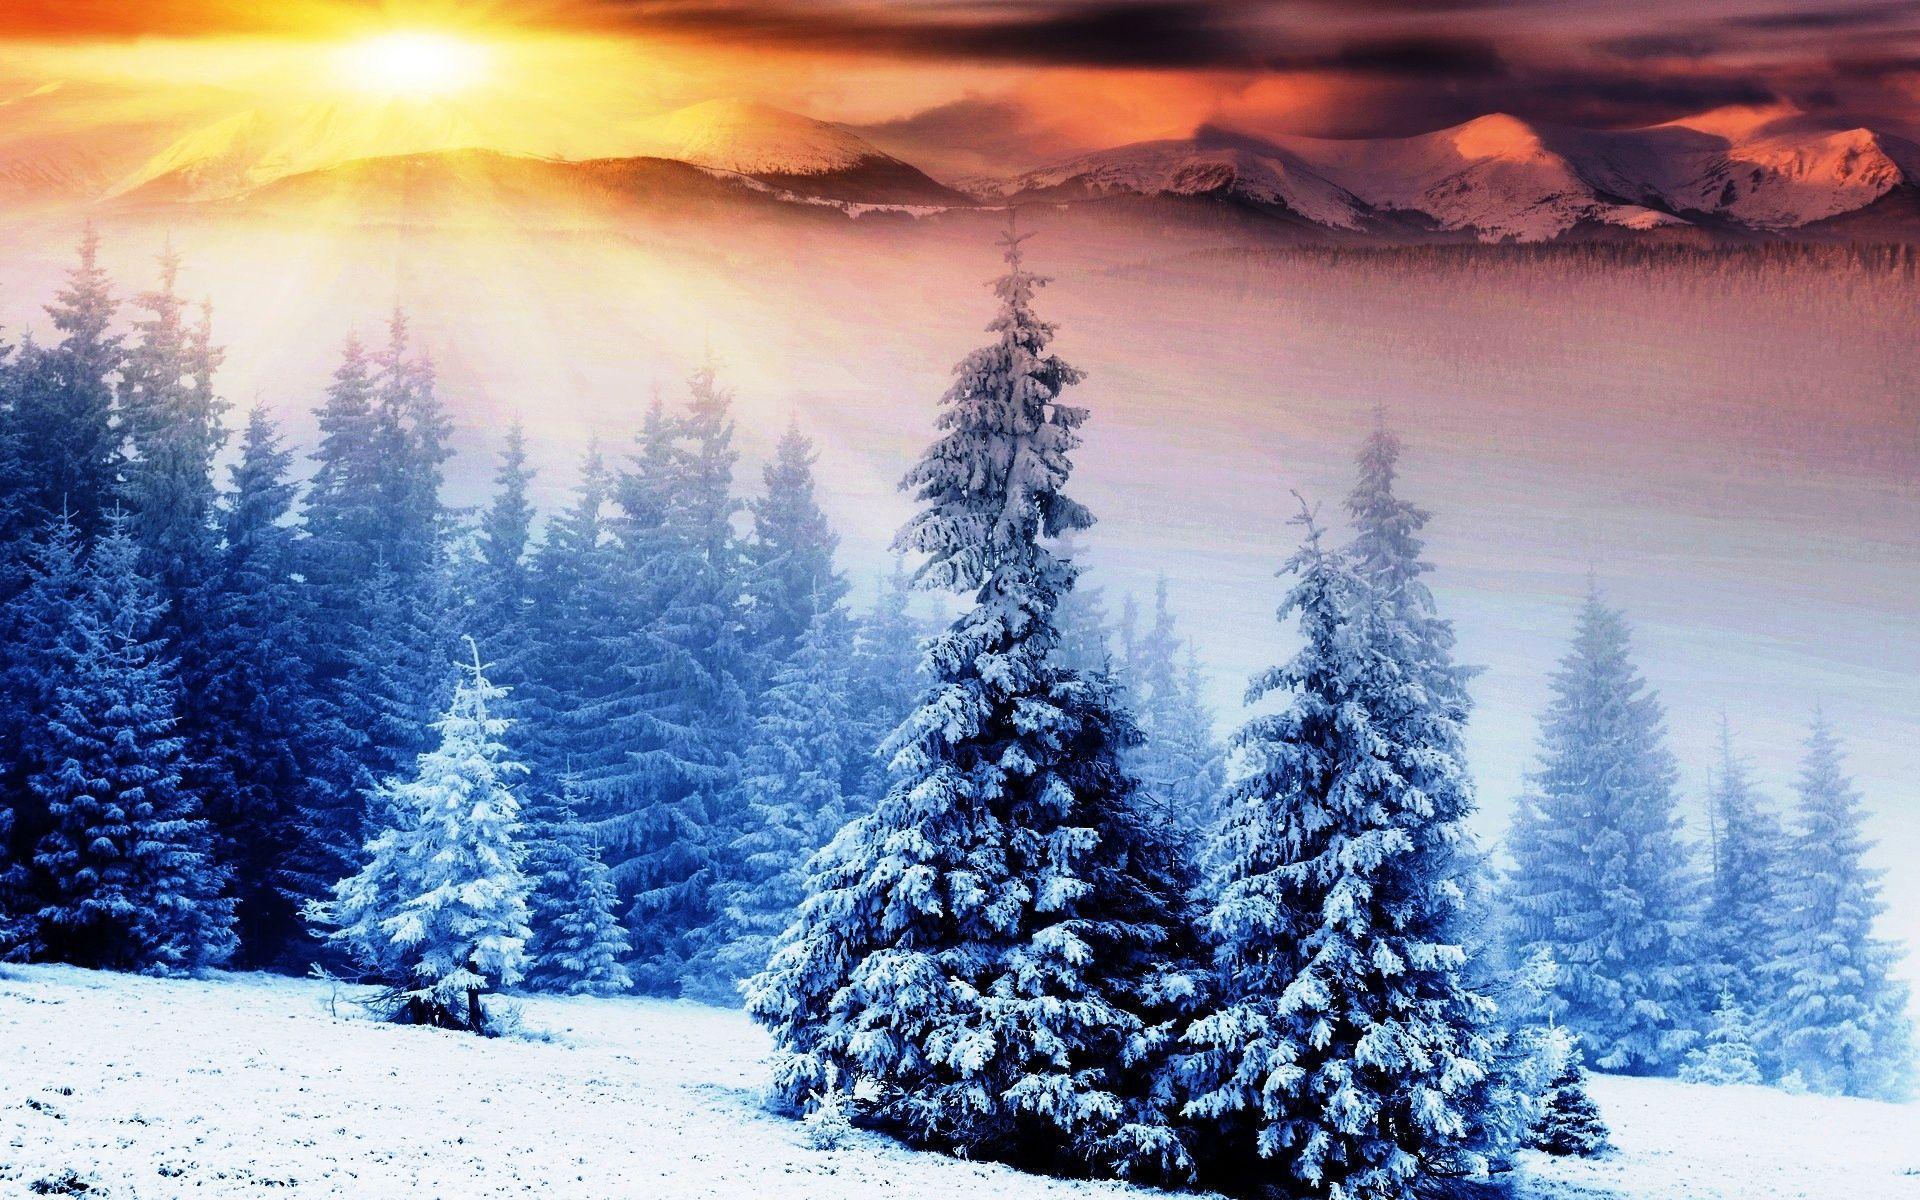 Winter Sunrise Desktop Wallpapers Top Free Winter Sunrise